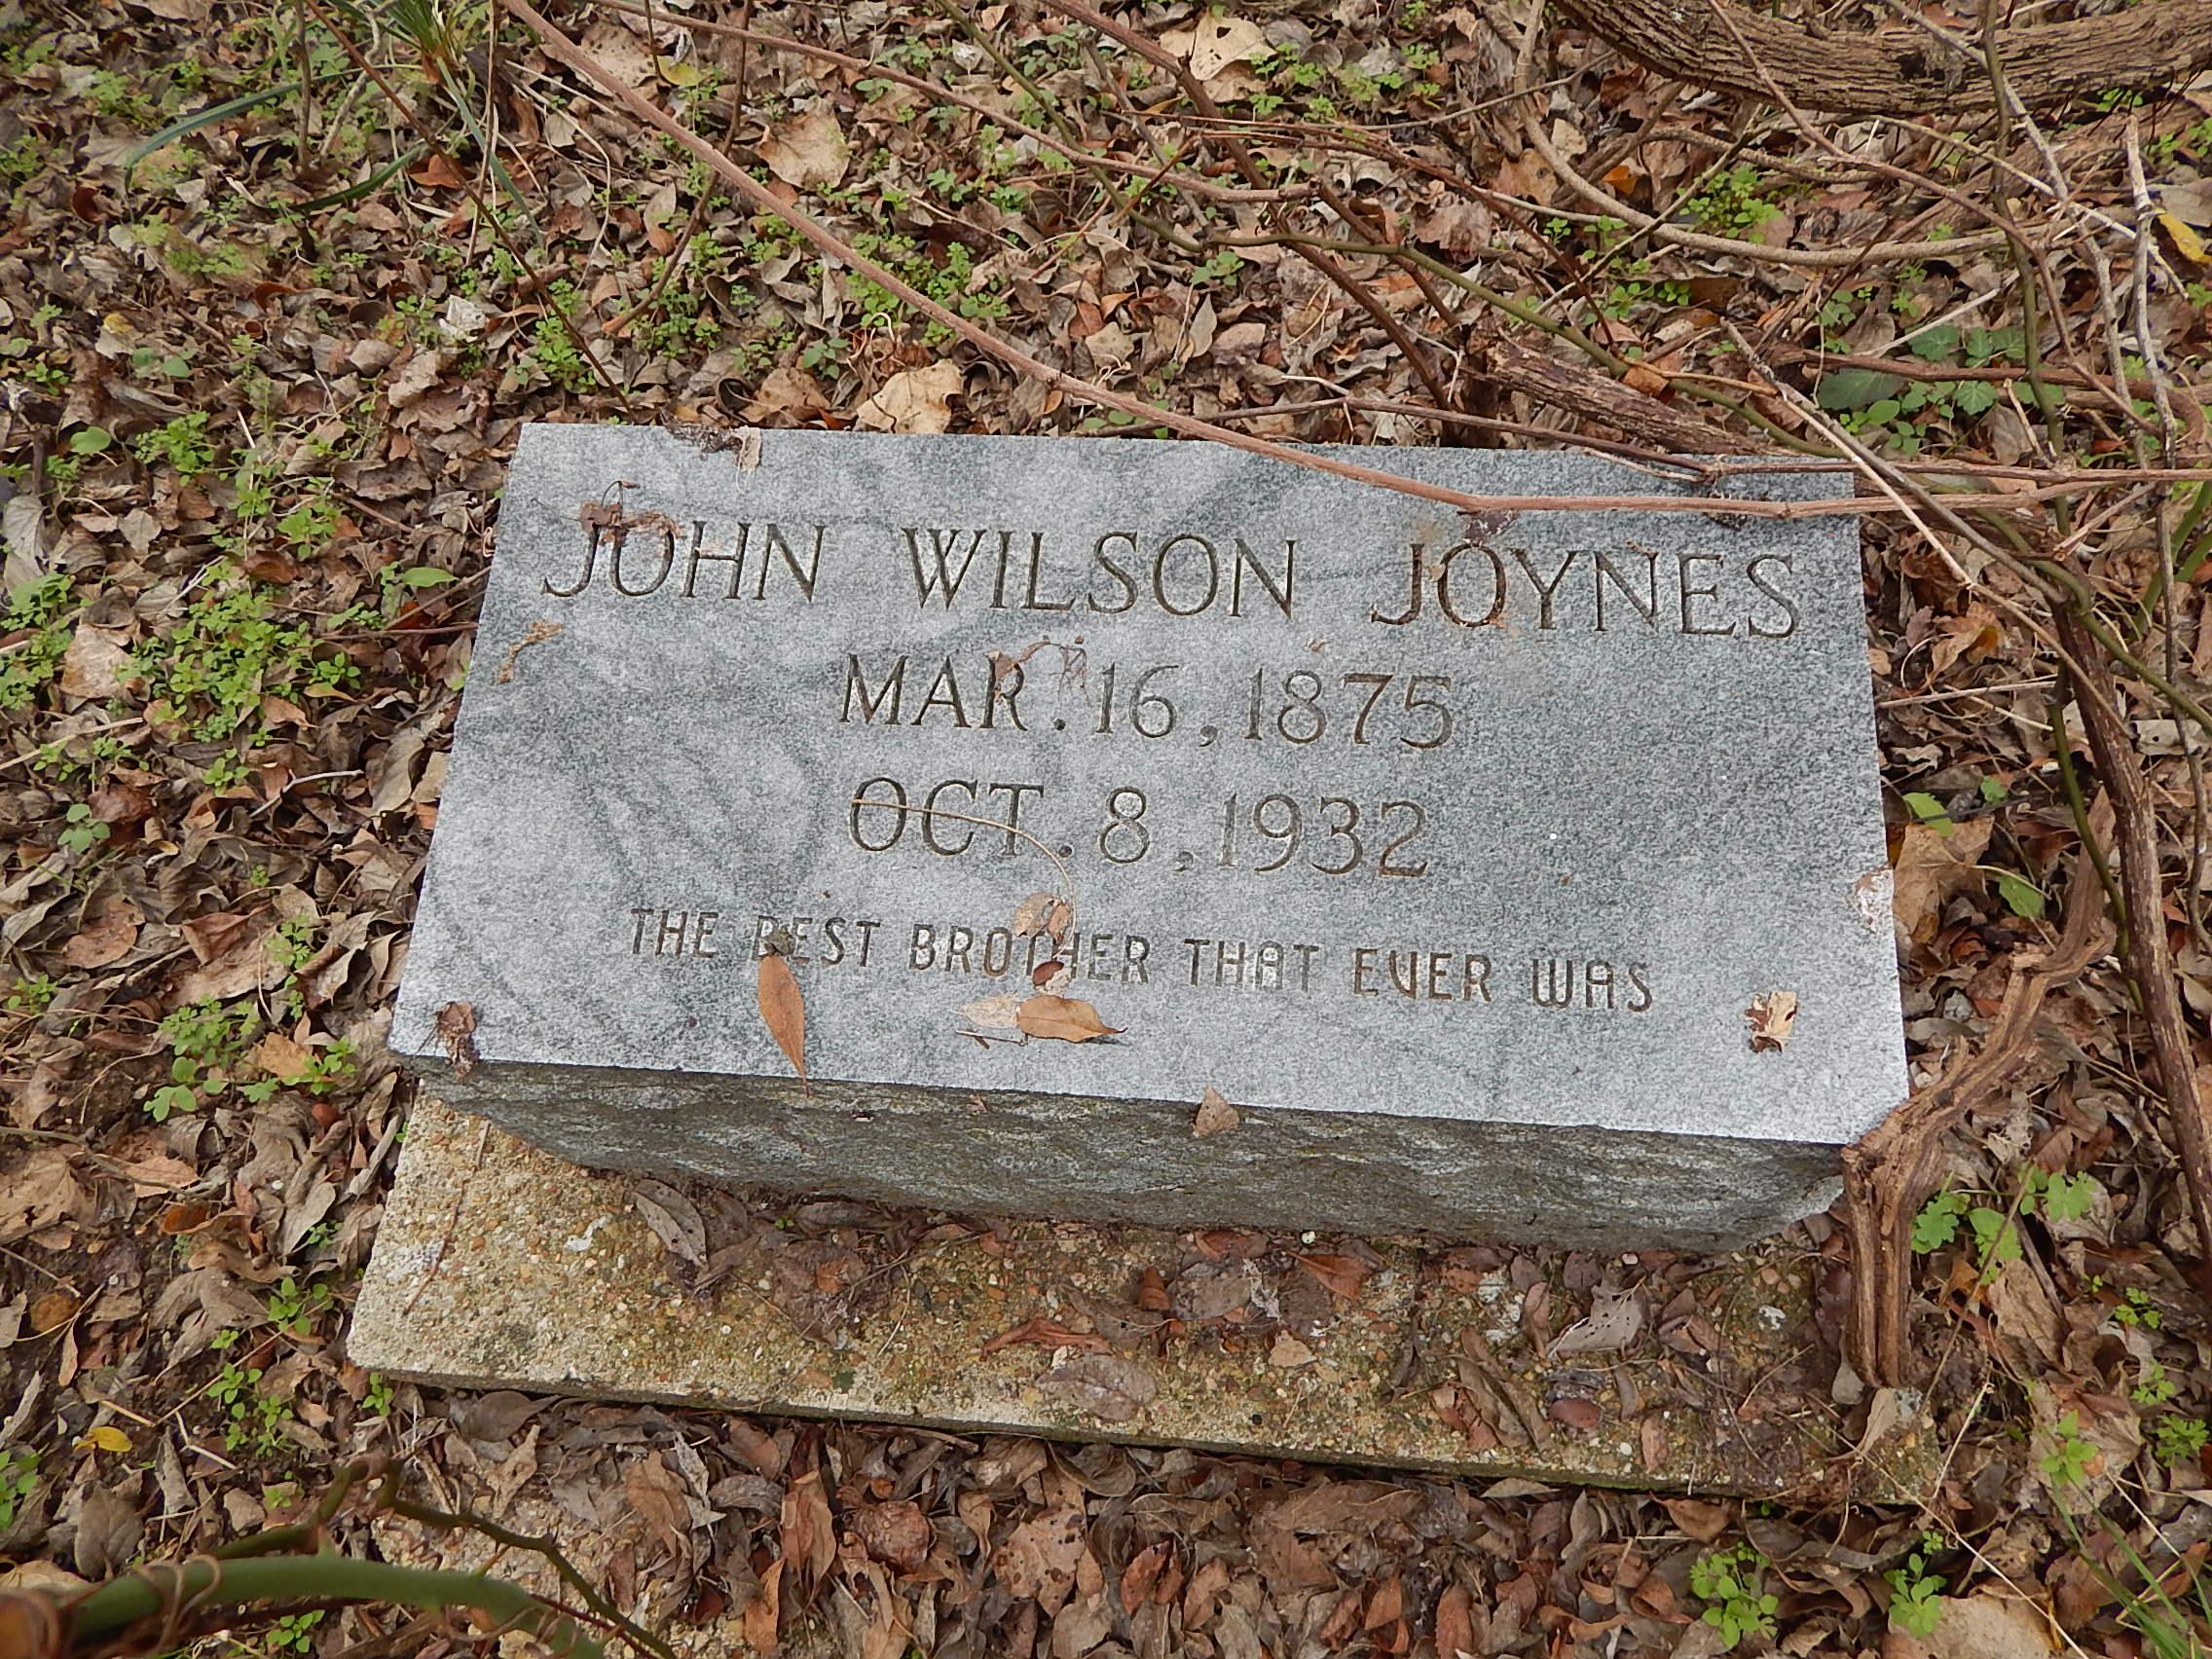 John Wilson Joynes